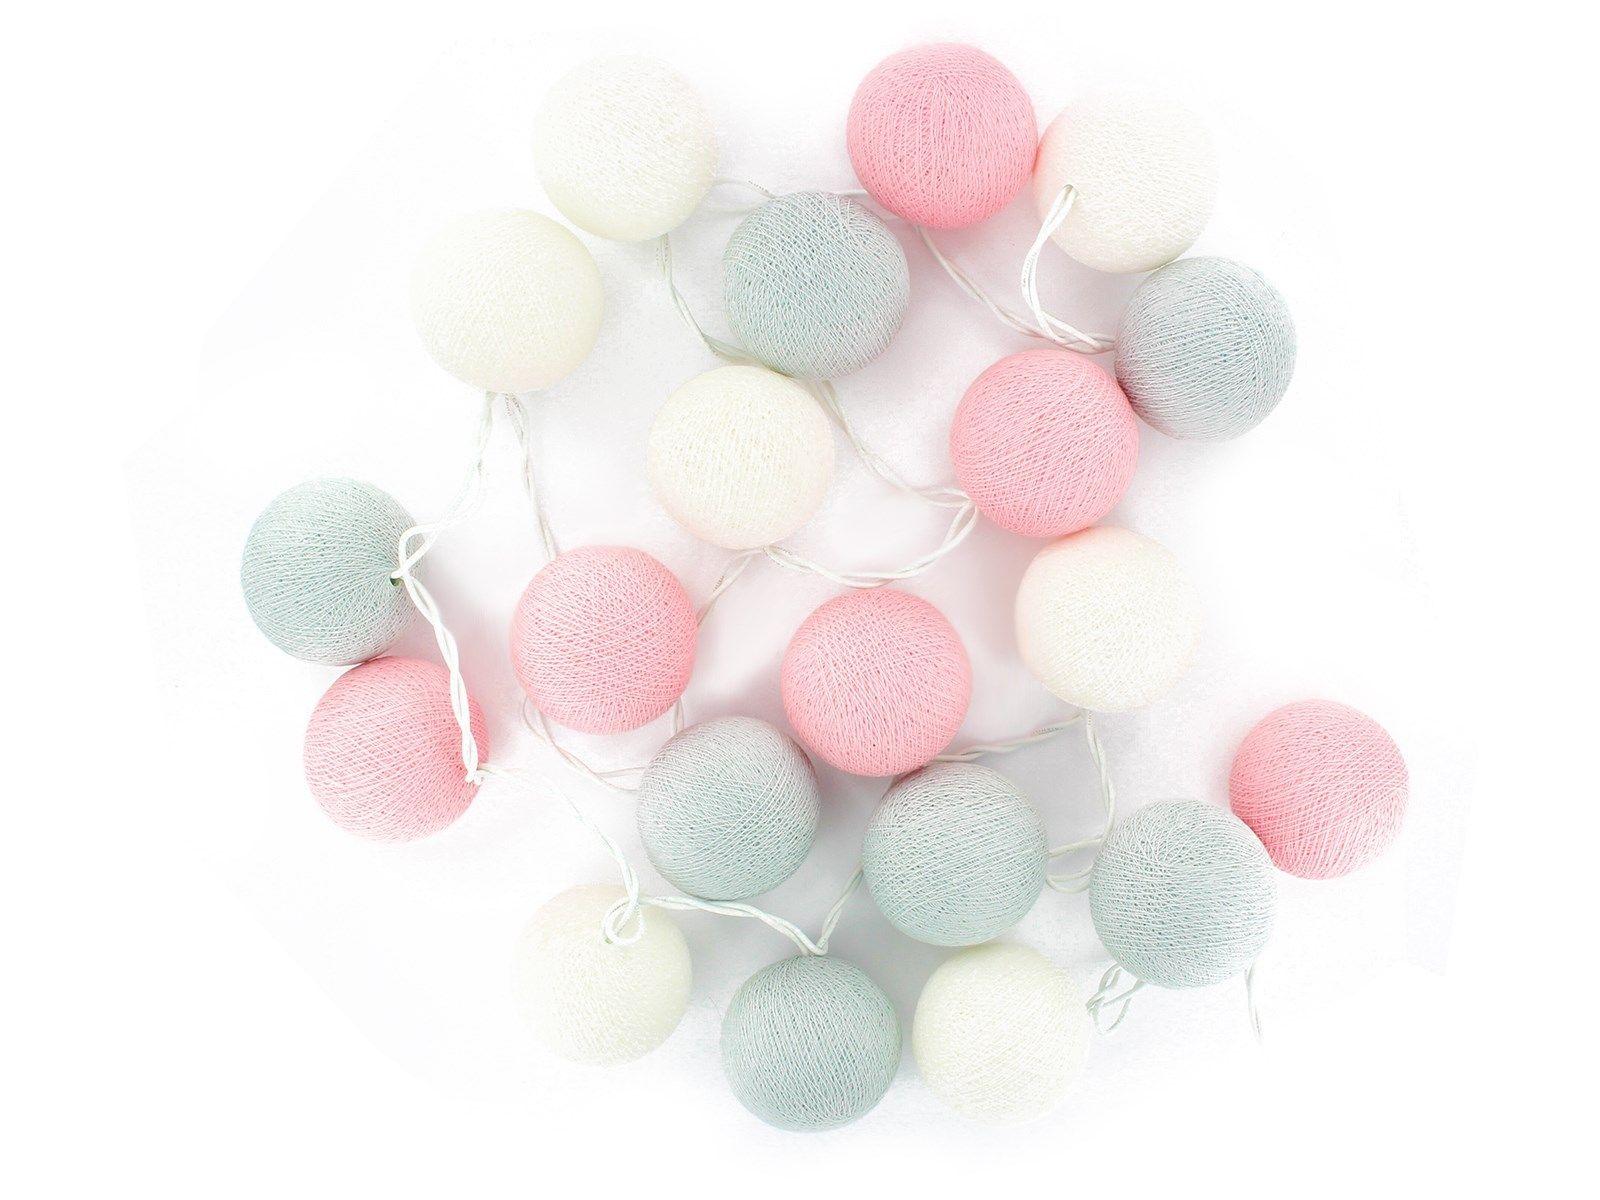 kugel lichterkette 20 handgefertigte kugeln marshmallow pinterest rosa grau lichterkette. Black Bedroom Furniture Sets. Home Design Ideas